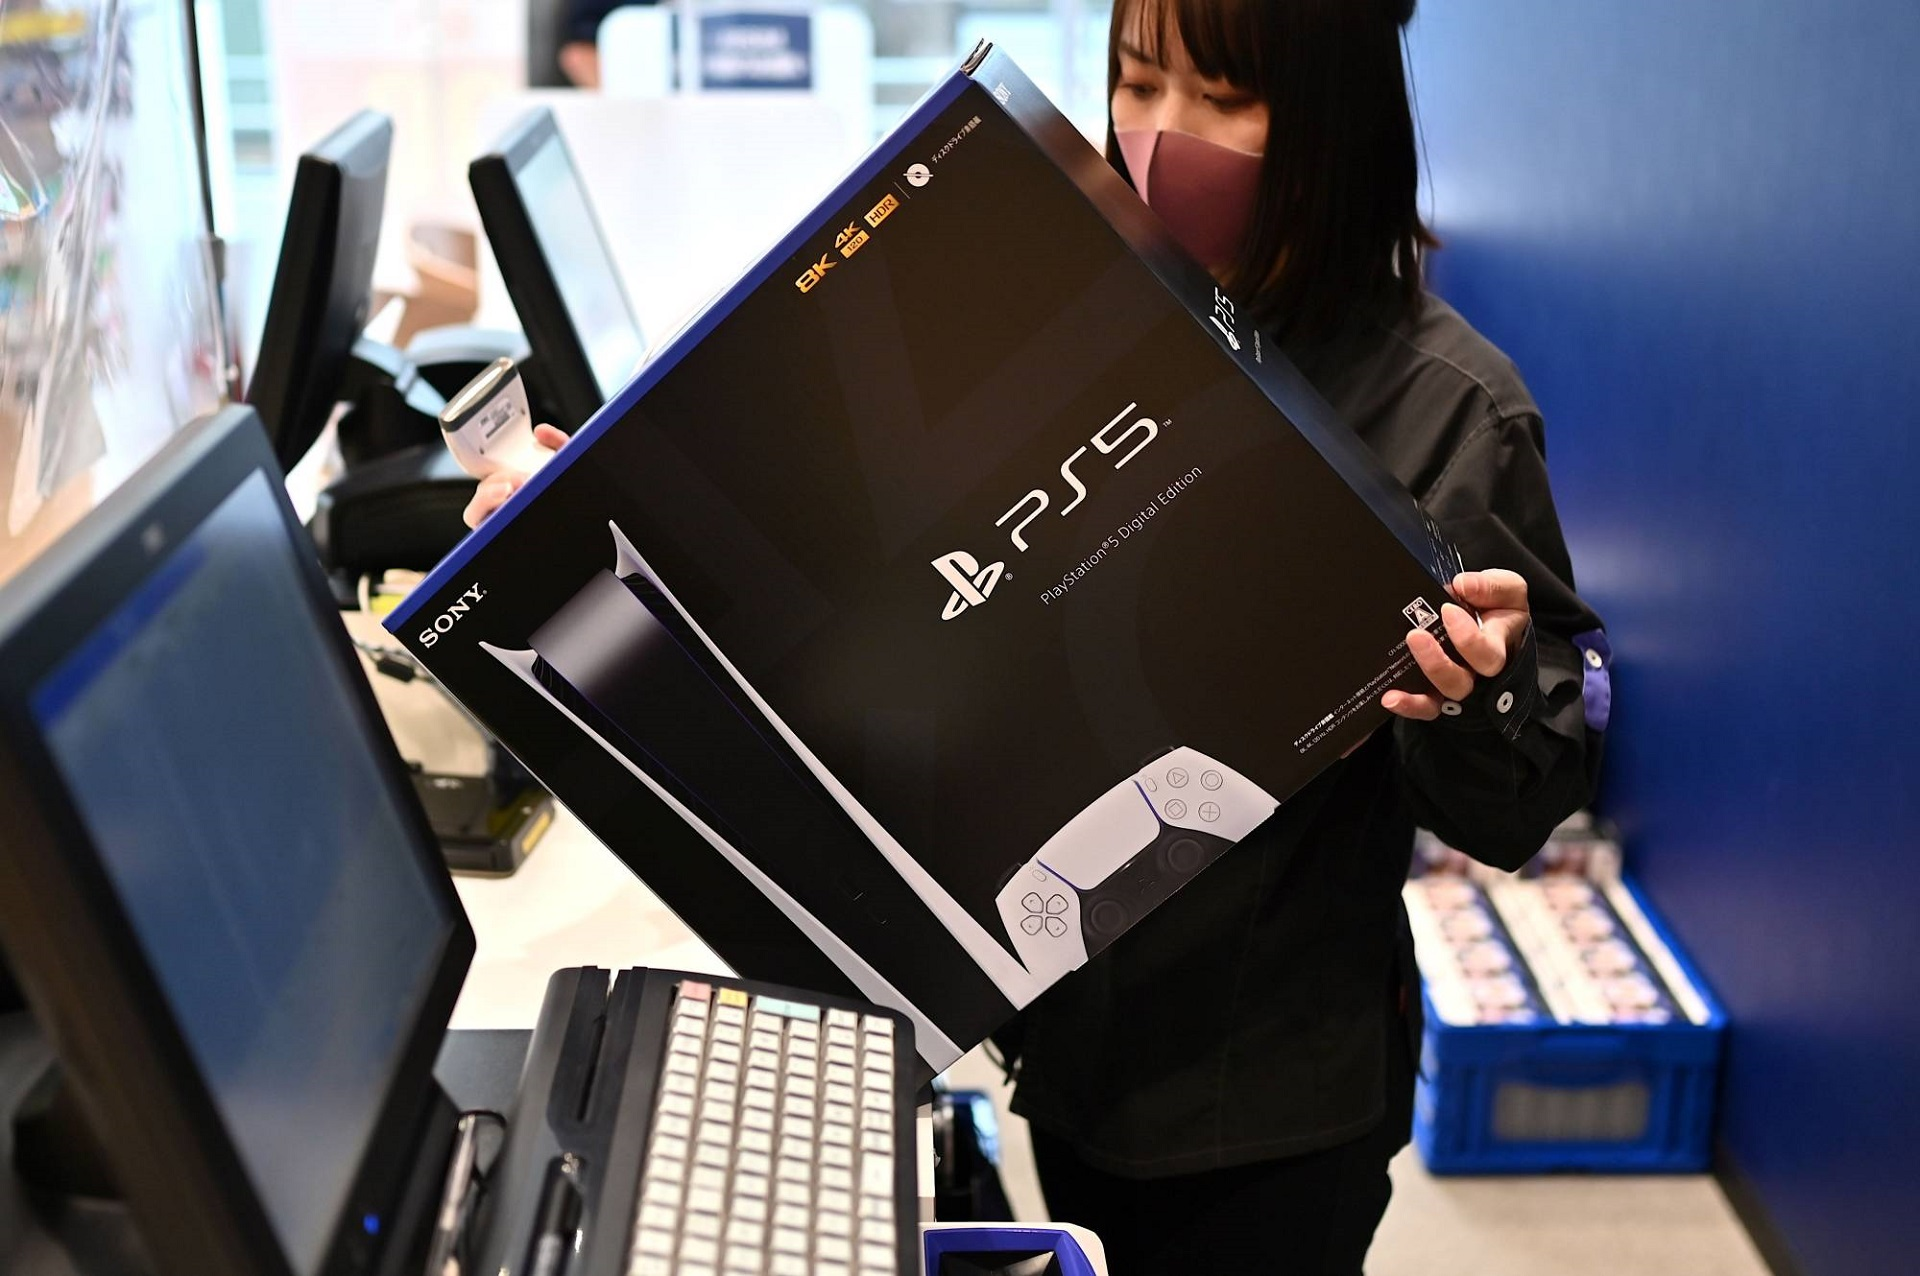 خرید کنسول پلی استیشن 5 دیجیتال در ژاپن